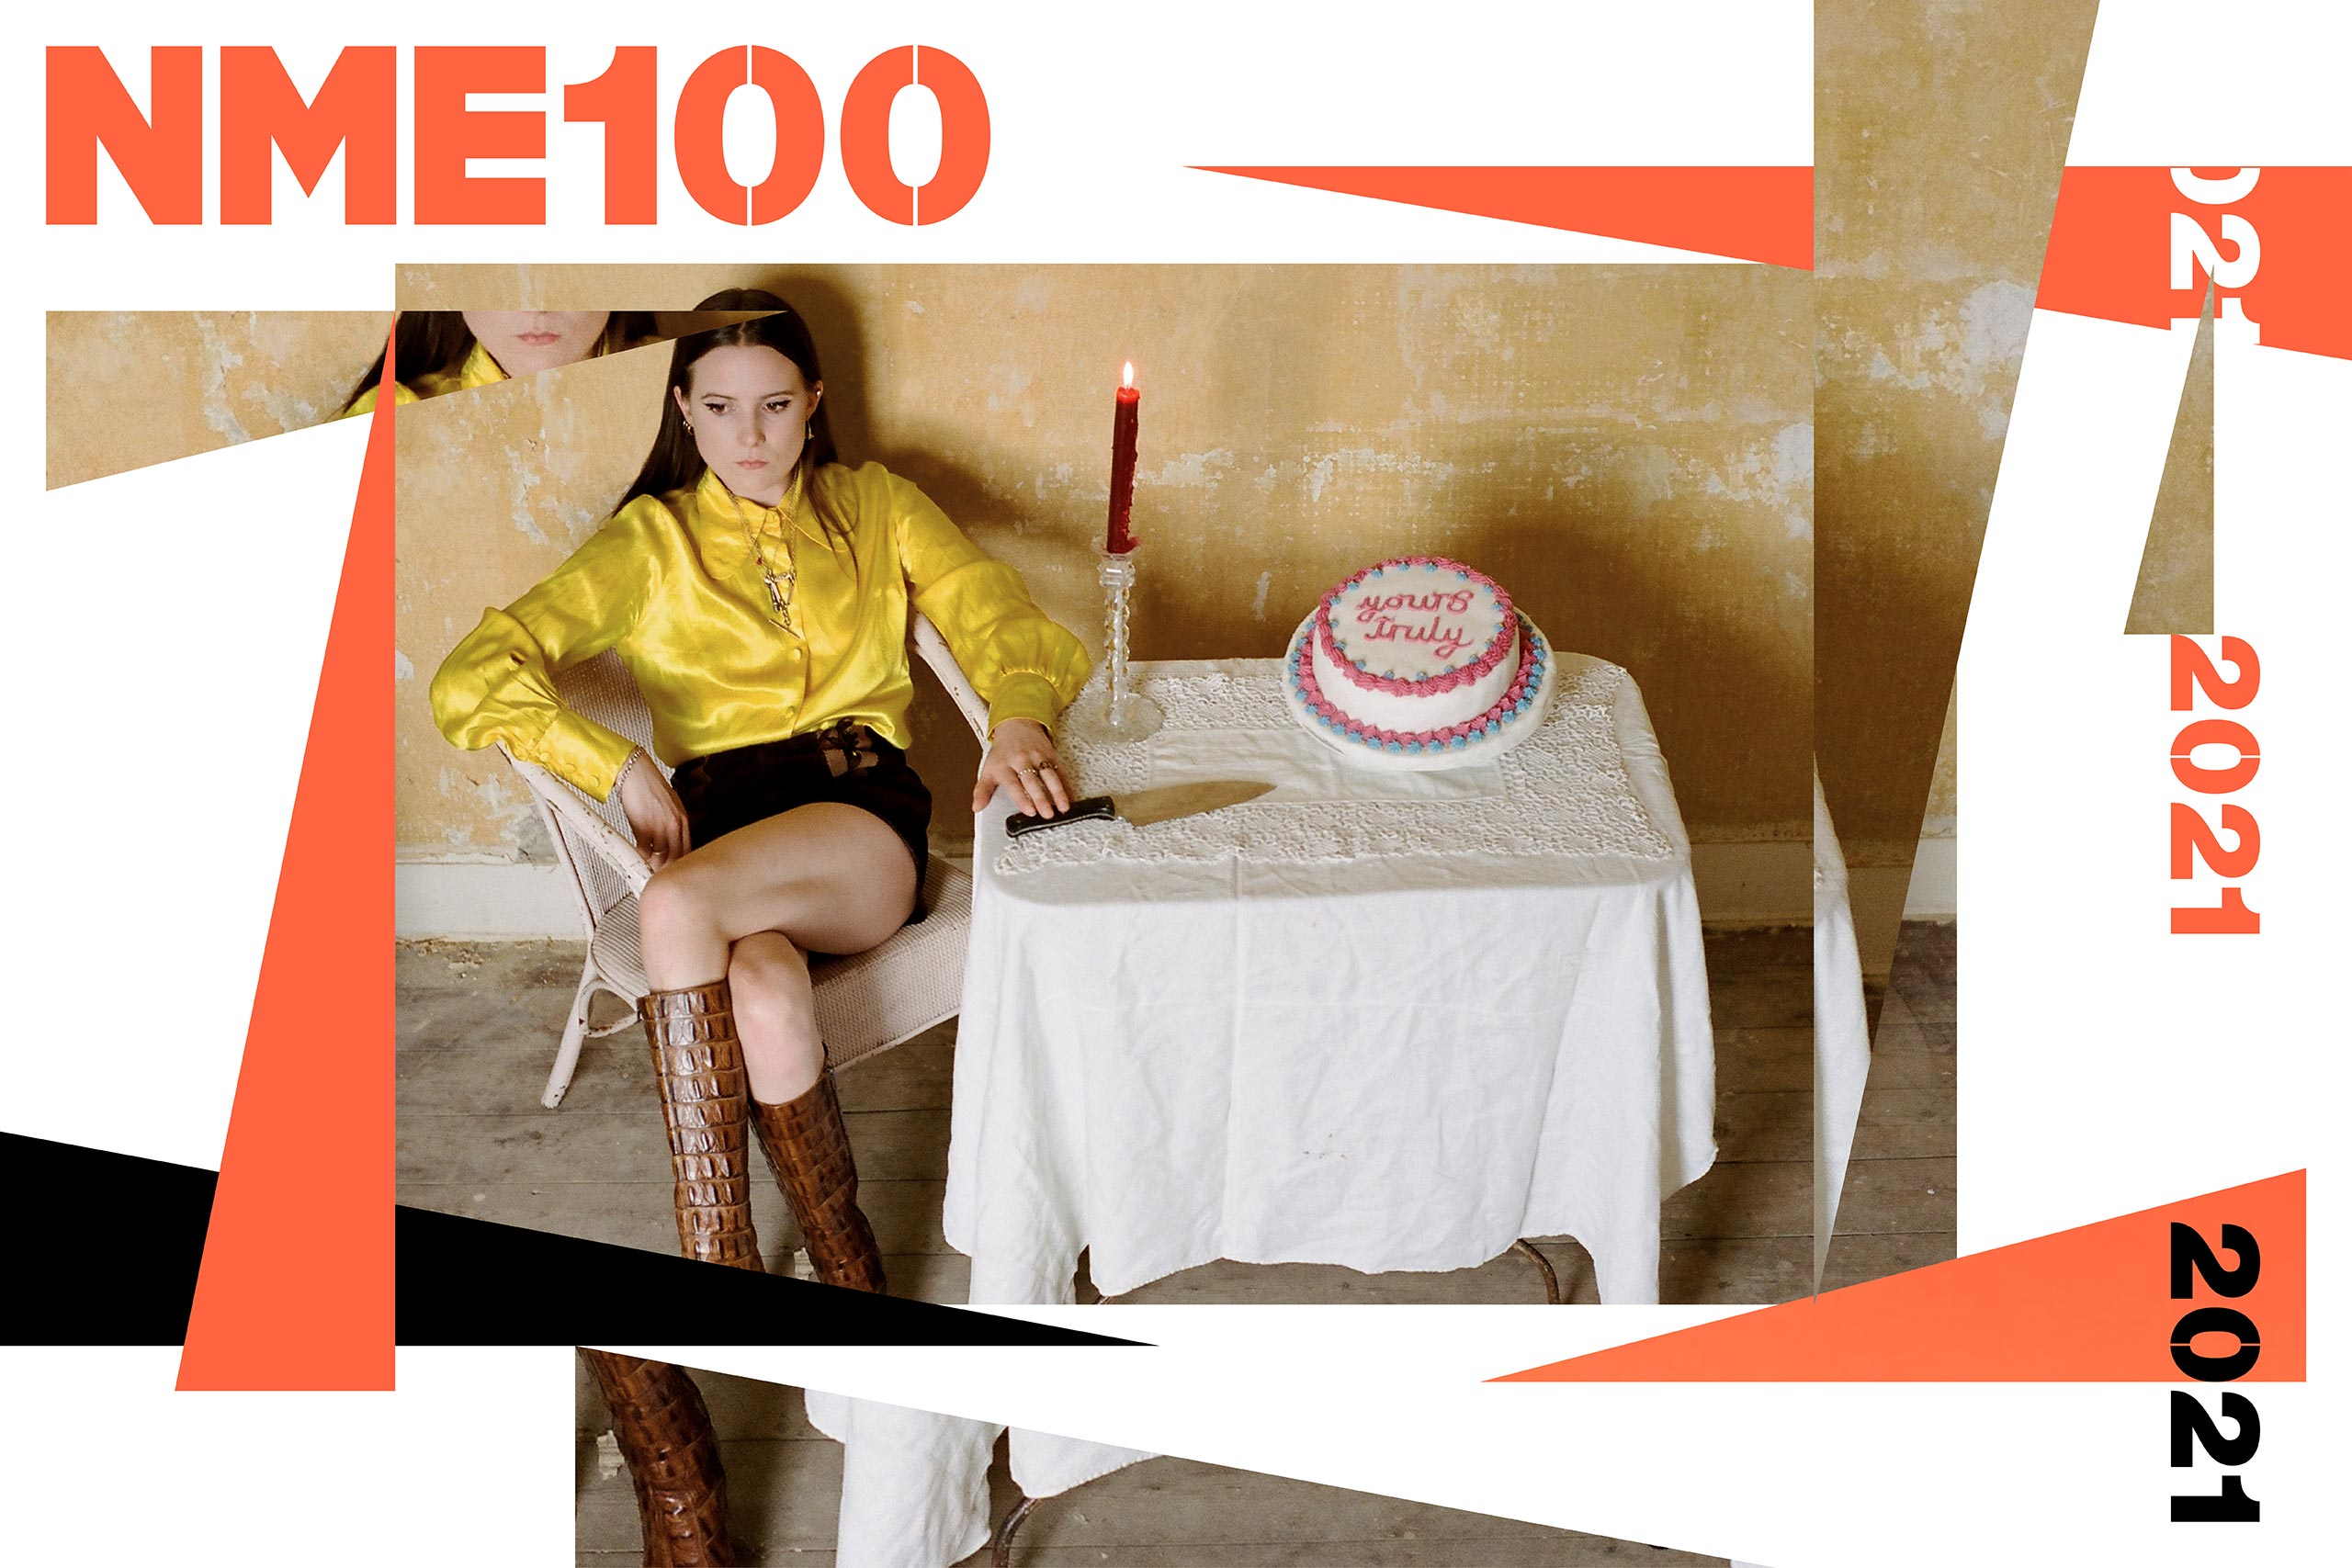 NME 100 martha skye murphy